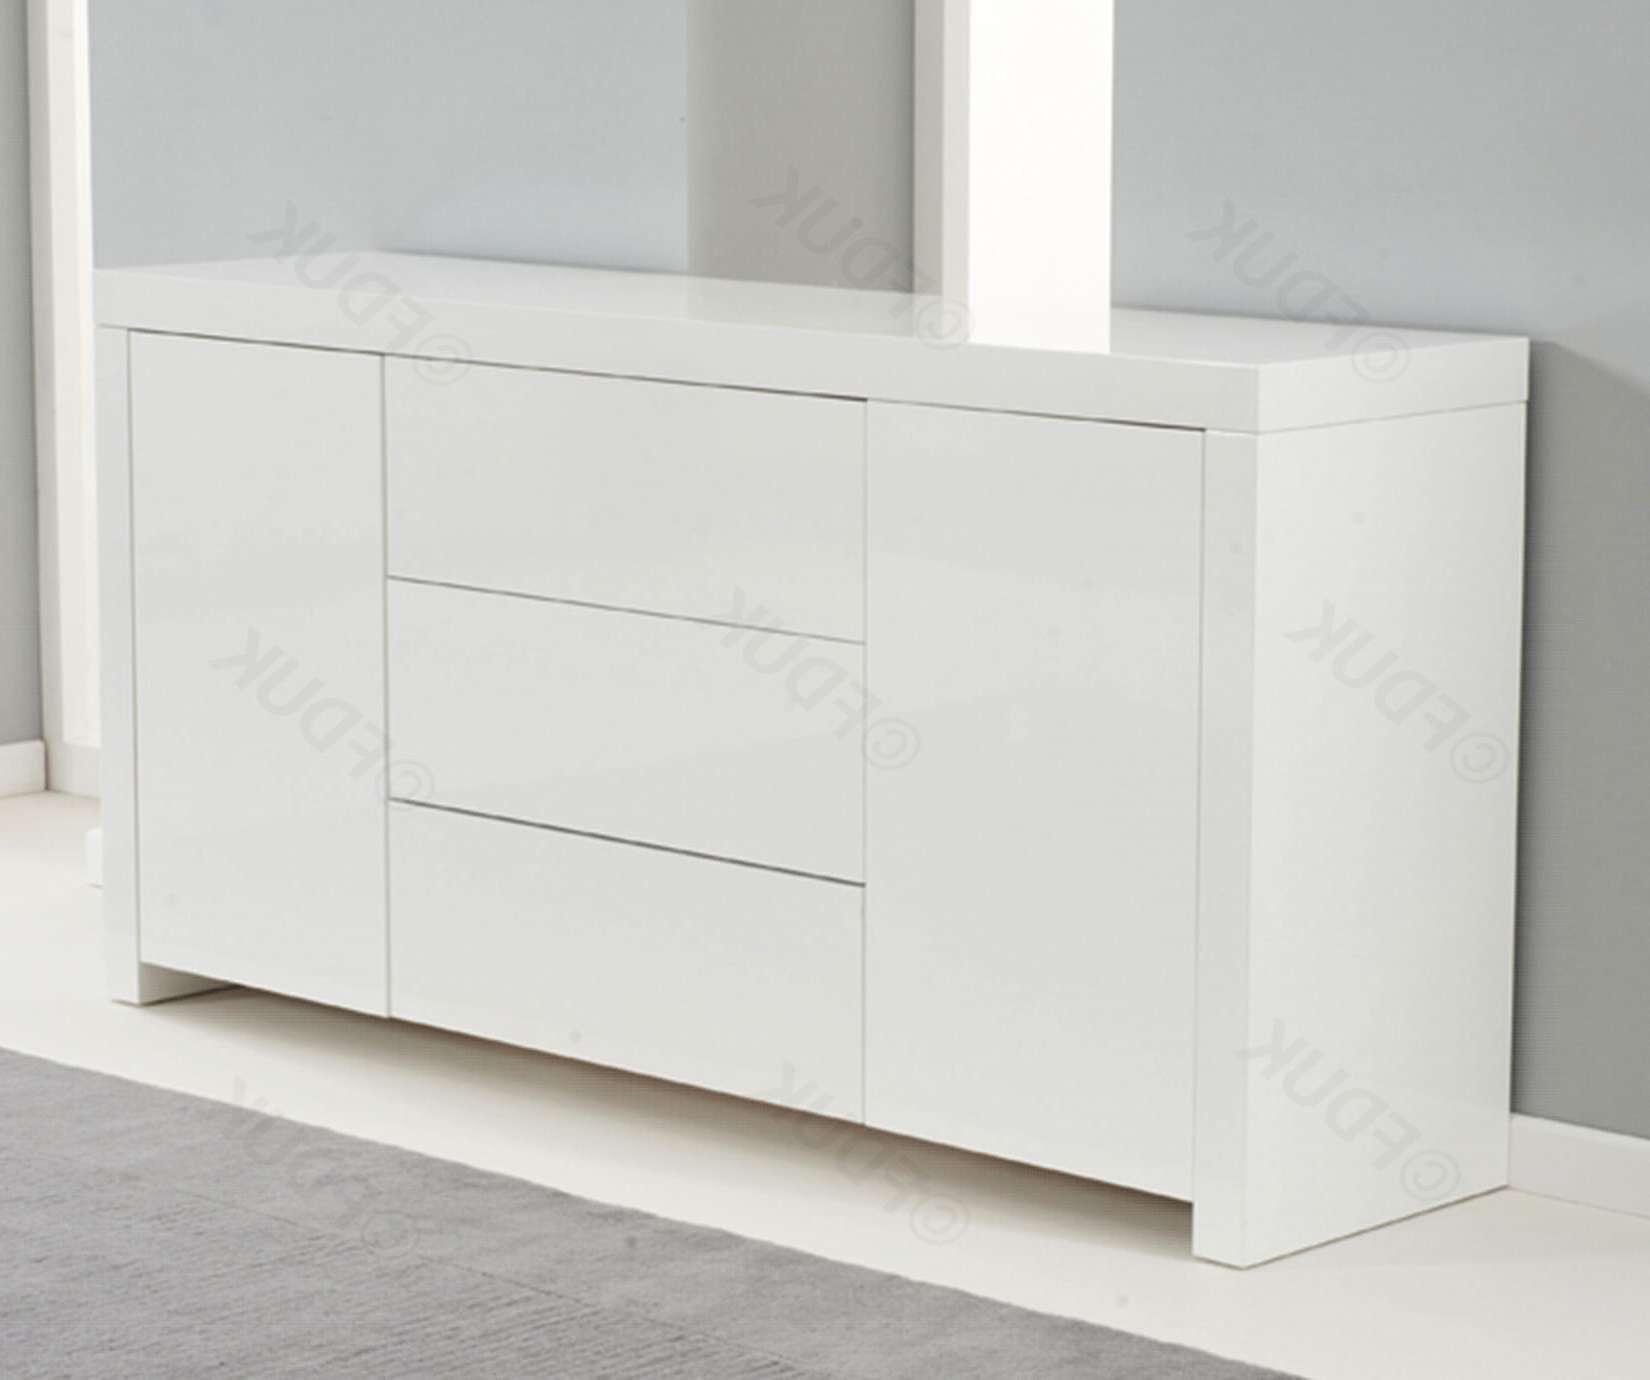 Mark Harris Hereford | Hereford White High Gloss Sideboard Intended For High White Gloss Sideboards (View 2 of 20)